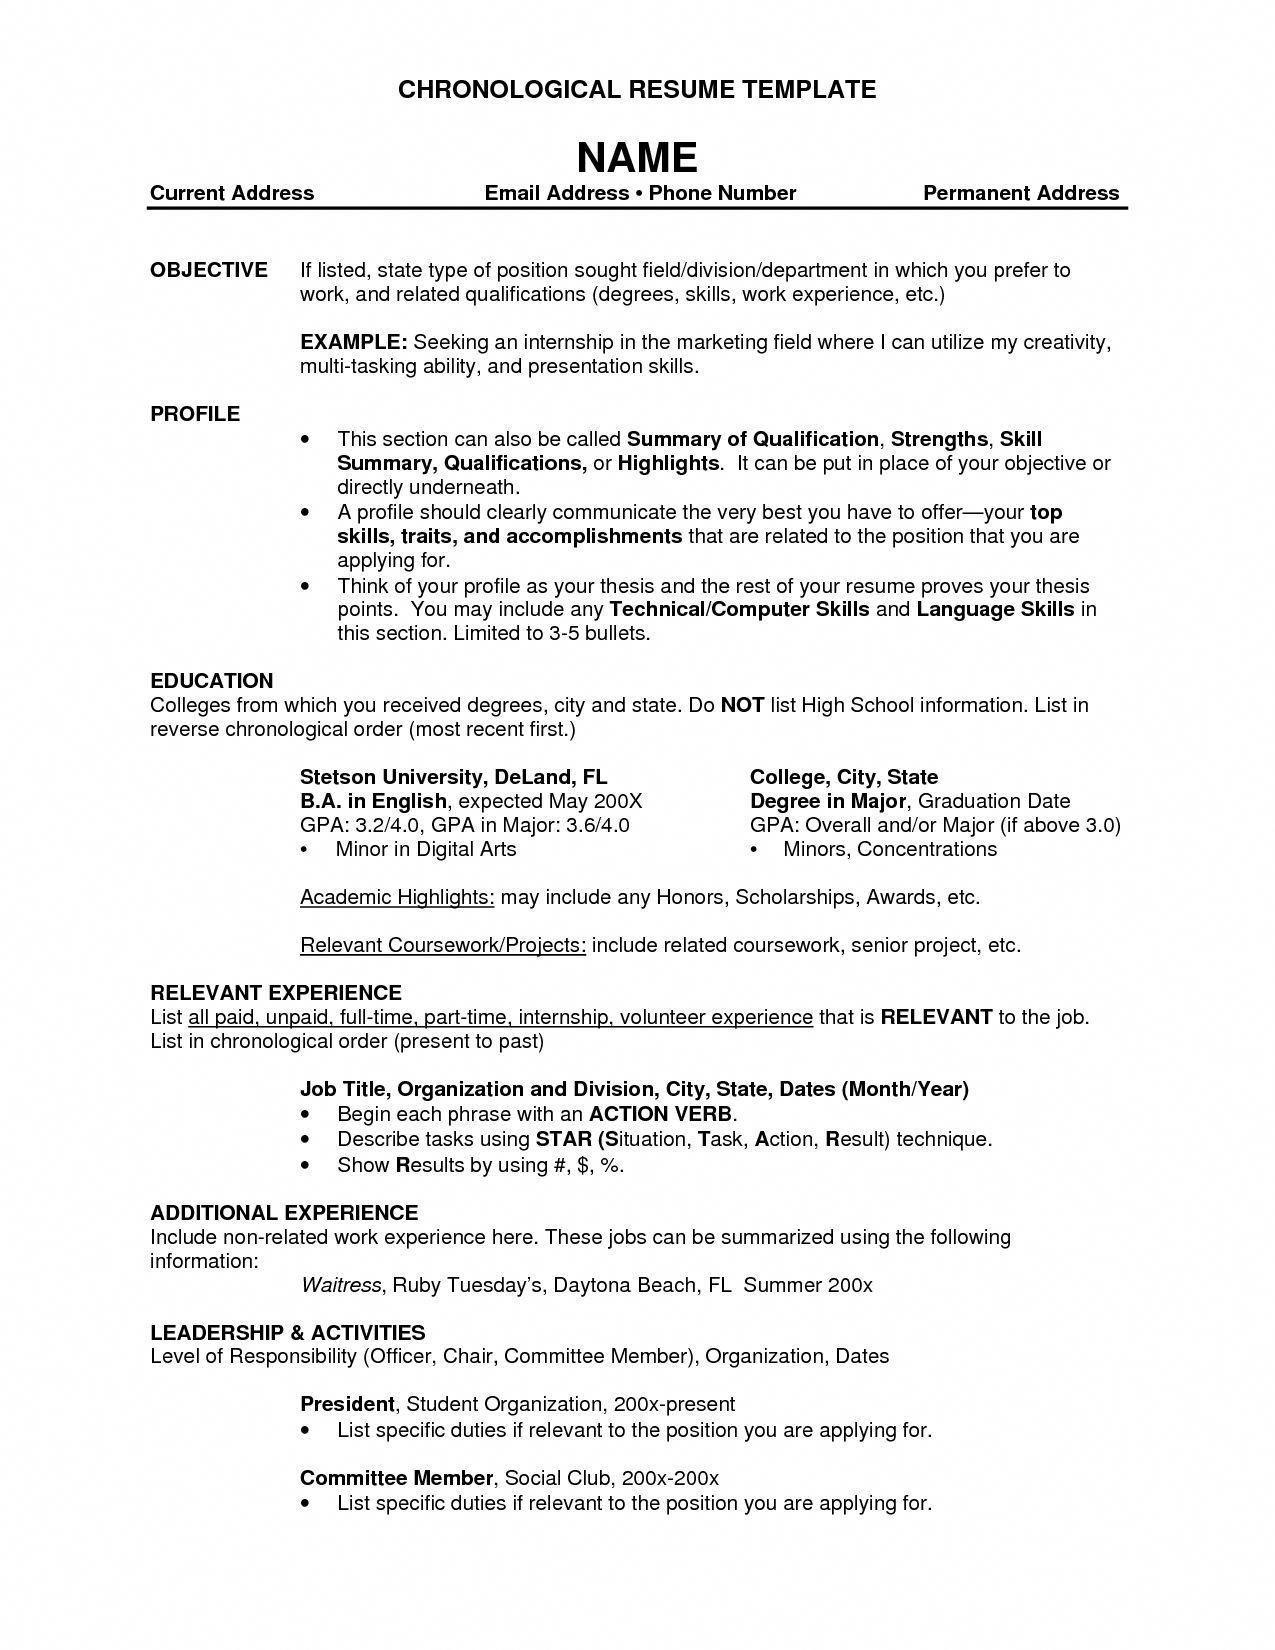 Resume Templates Tamu Resume Resumetemplates Templates Resume Resumetemplates Templates Resume Examples Student Resume Chronological Resume Template